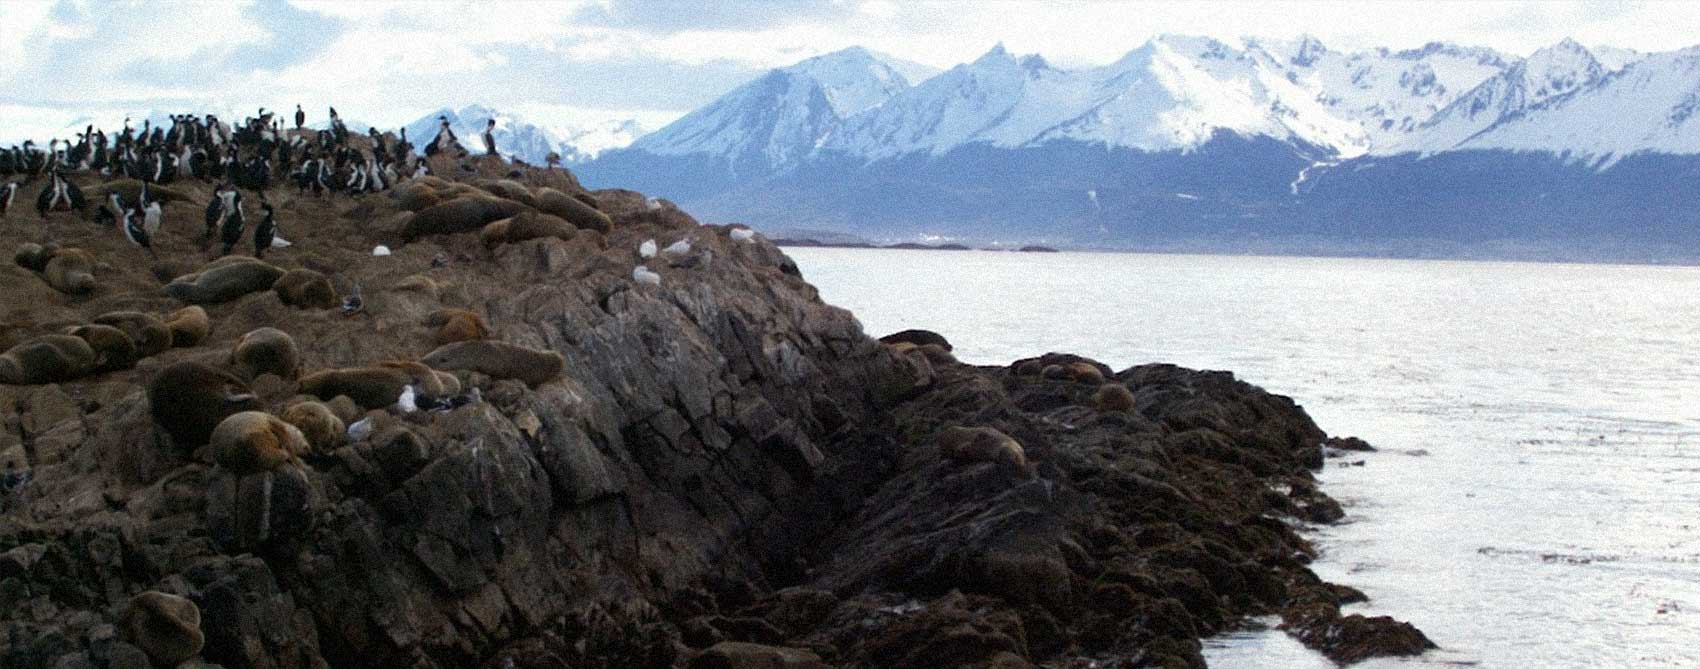 Patagonia Austral